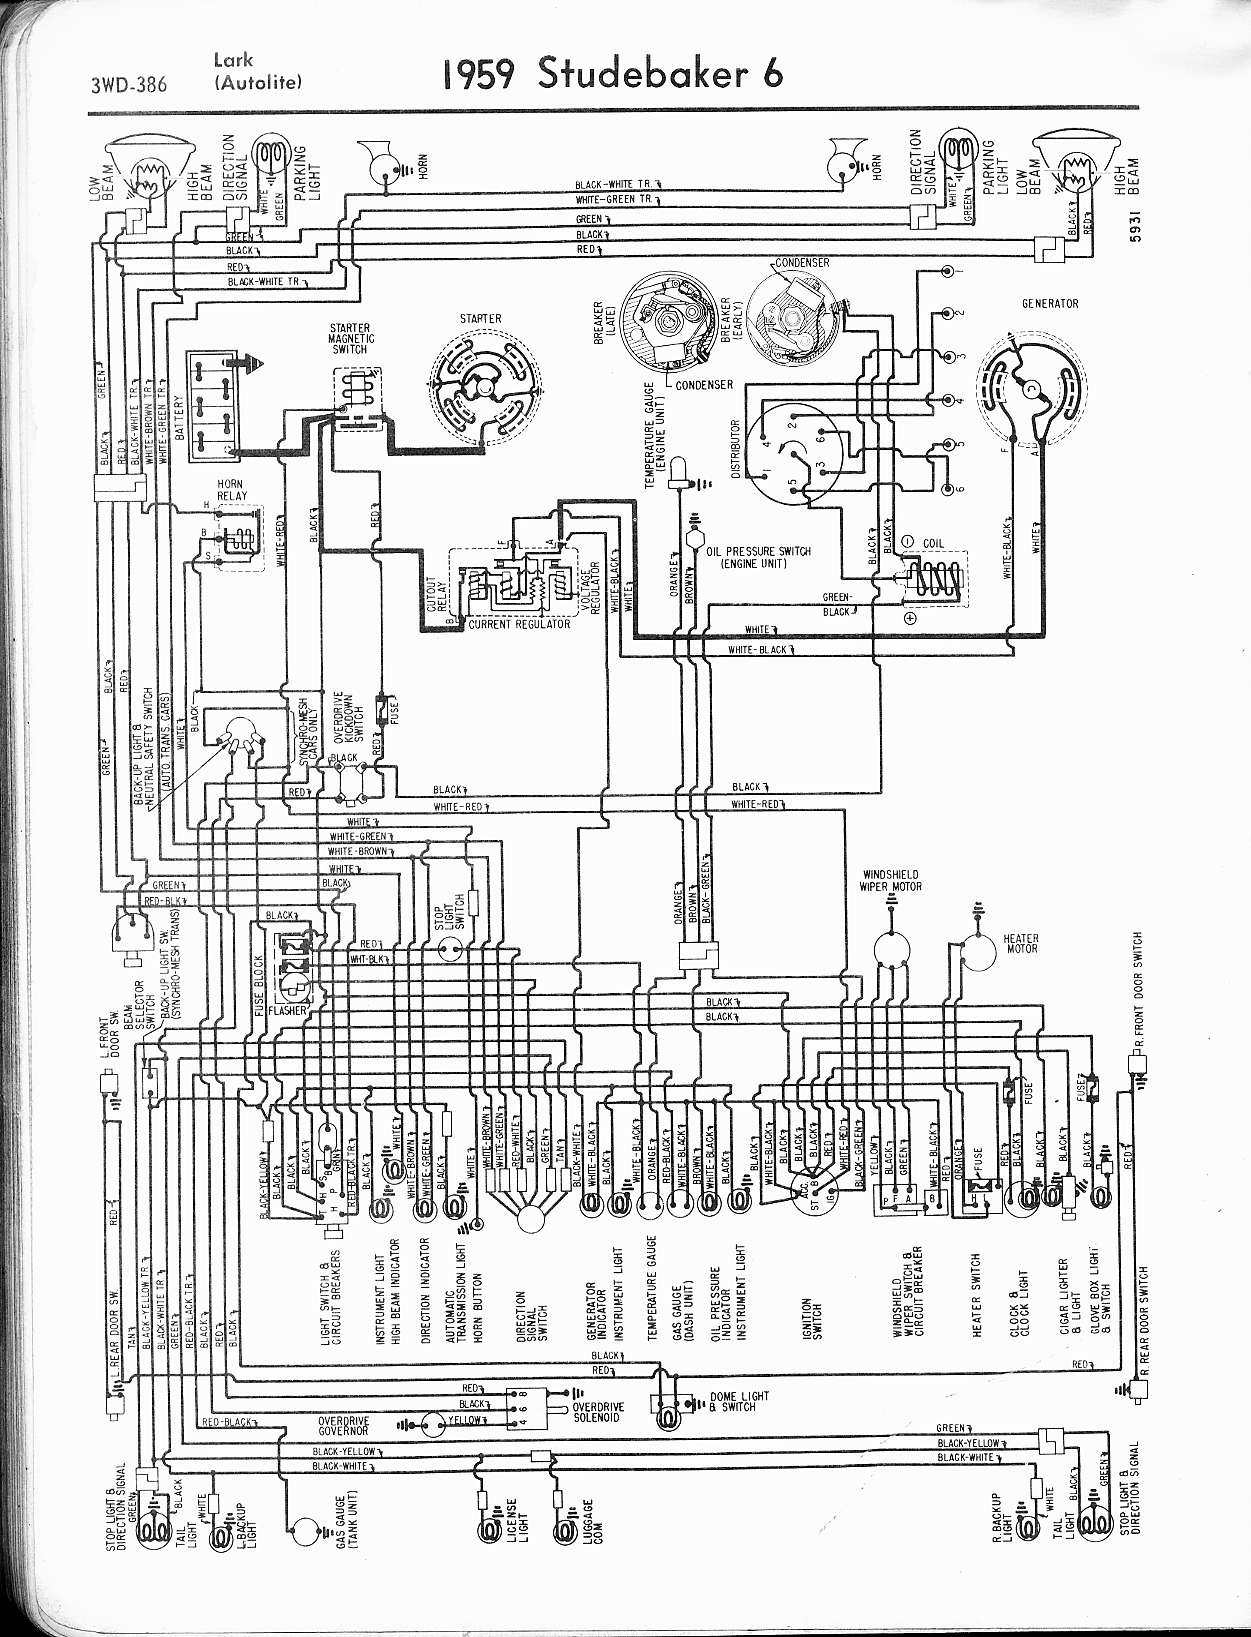 [DIAGRAM] 1950 Studebaker Wiring Diagram Schematic FULL